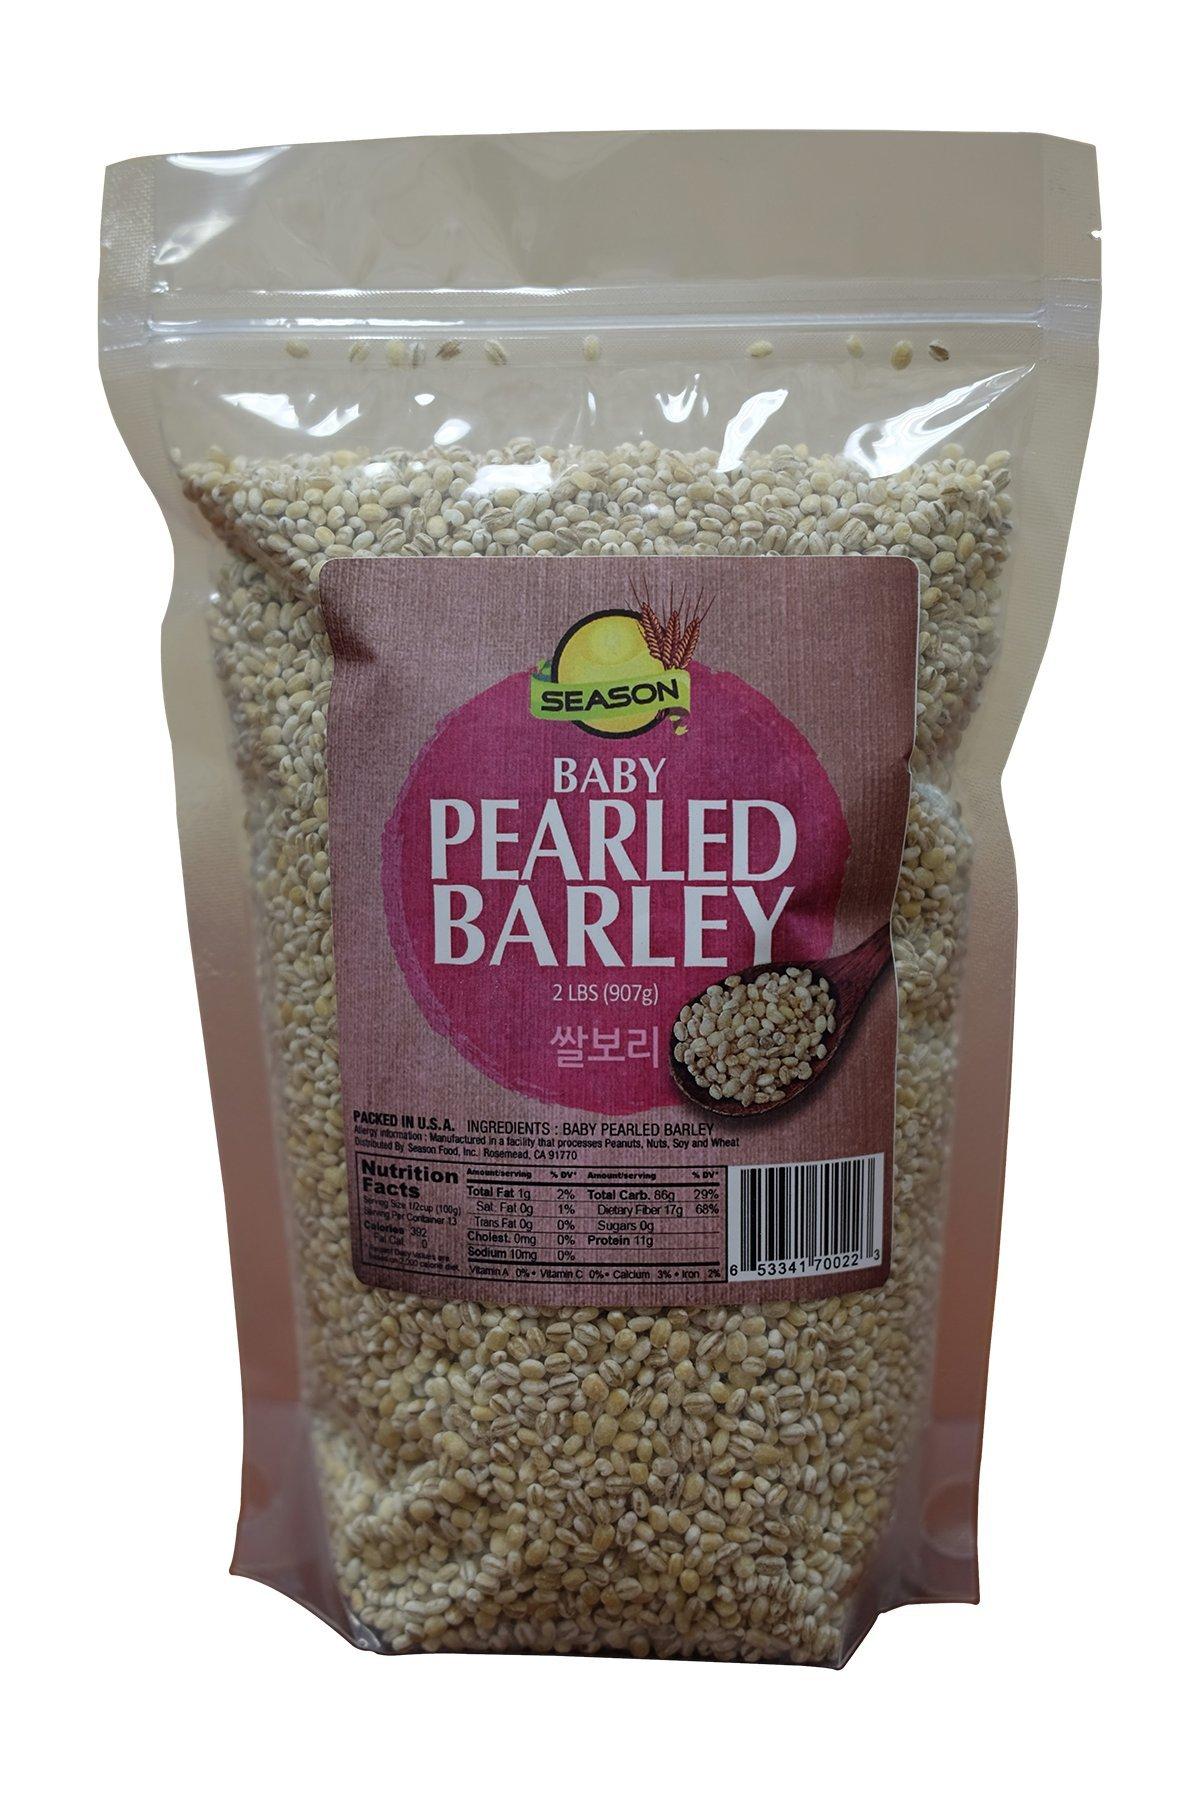 Season Baby Pearled Barley, 2-Pound